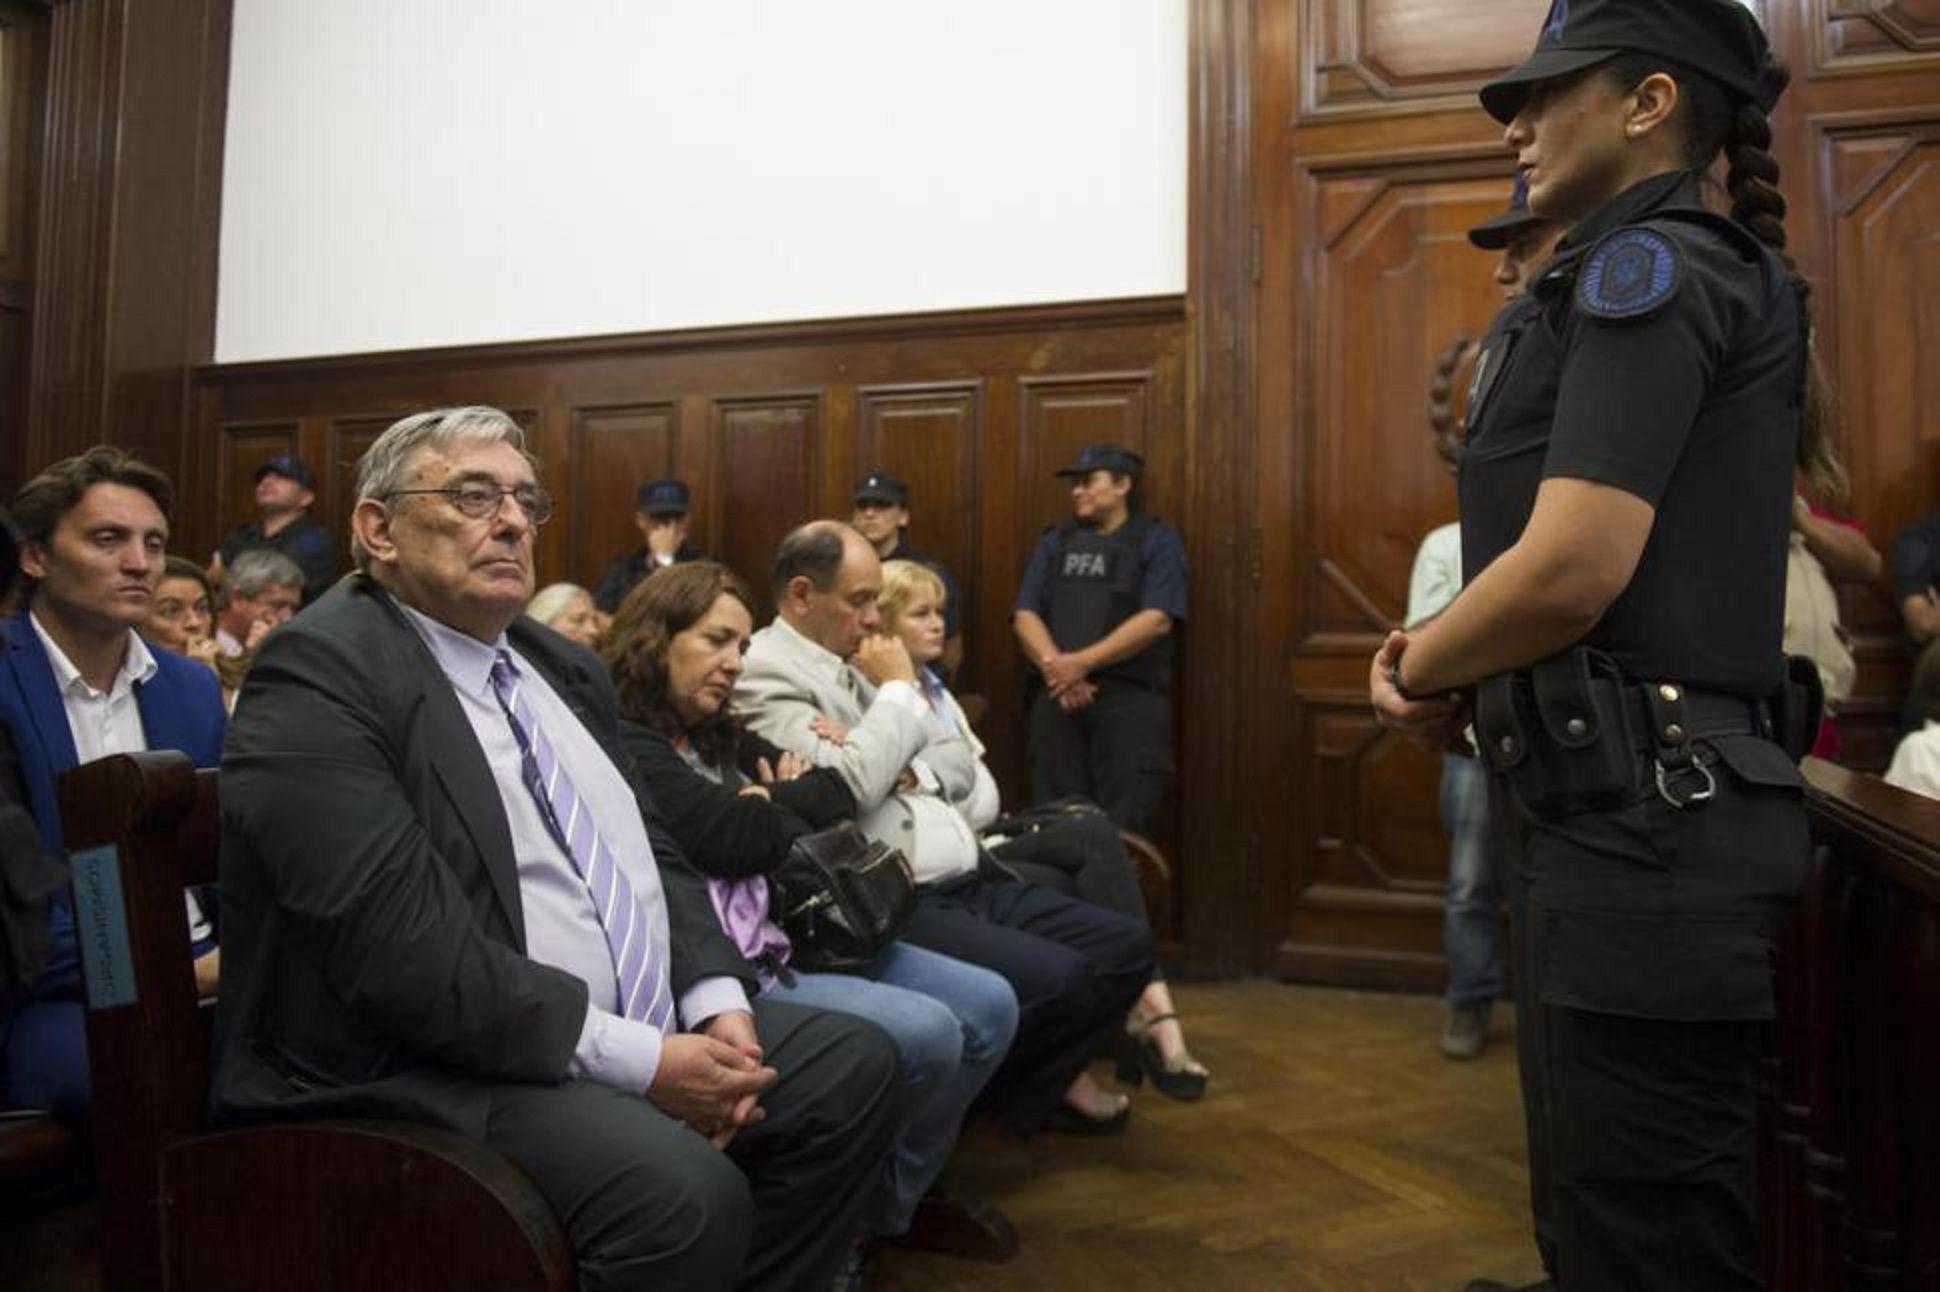 Lebbos escucha la sentencia. Foto: La Gaceta de Tucumán